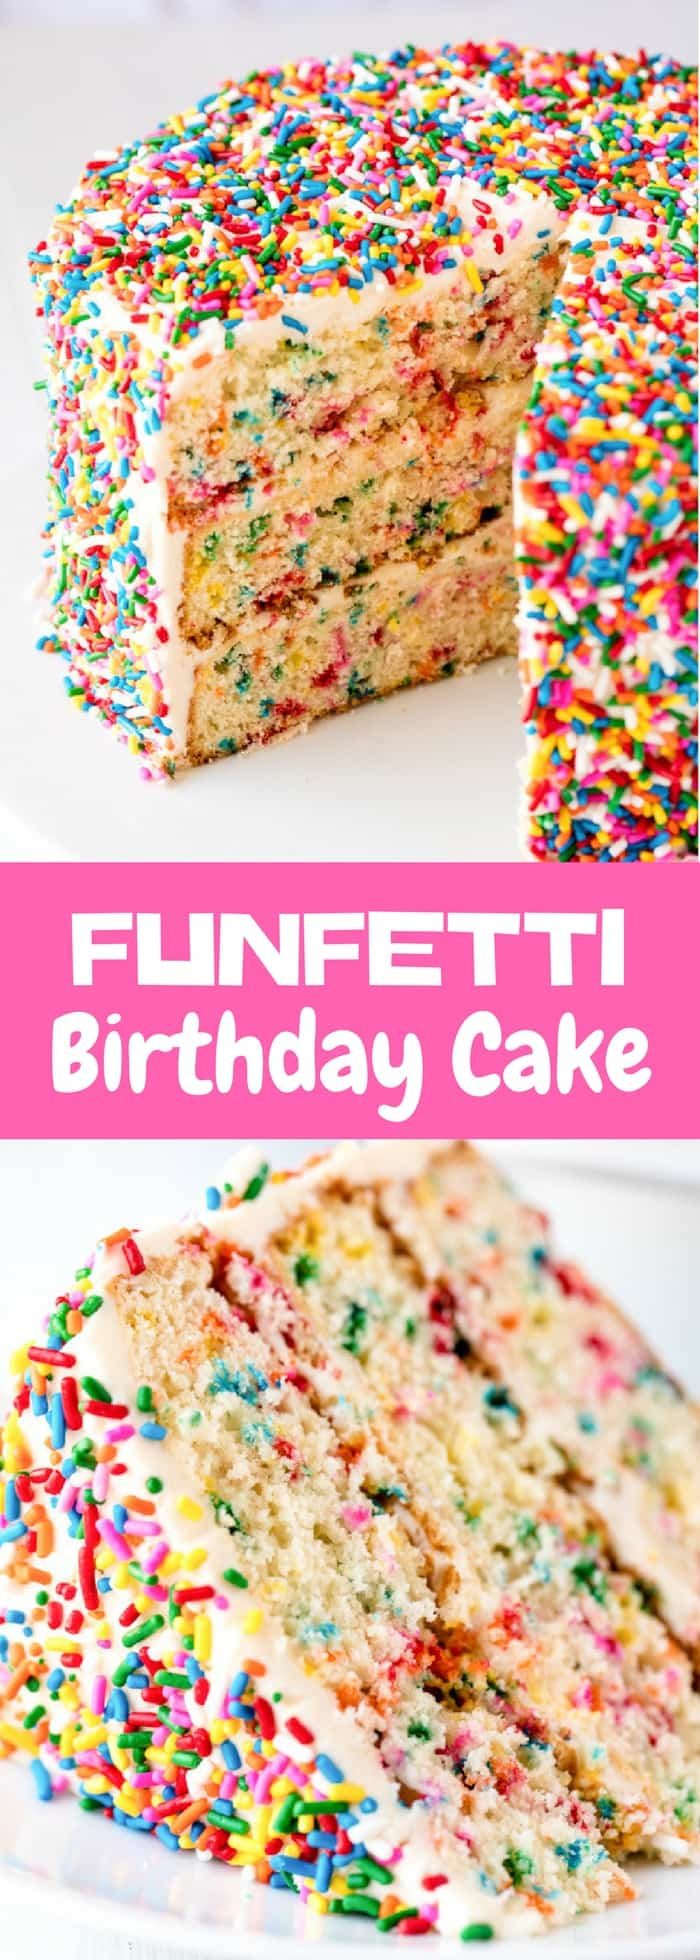 Marvelous Funfetti Birthday Cake Funny Birthday Cards Online Alyptdamsfinfo